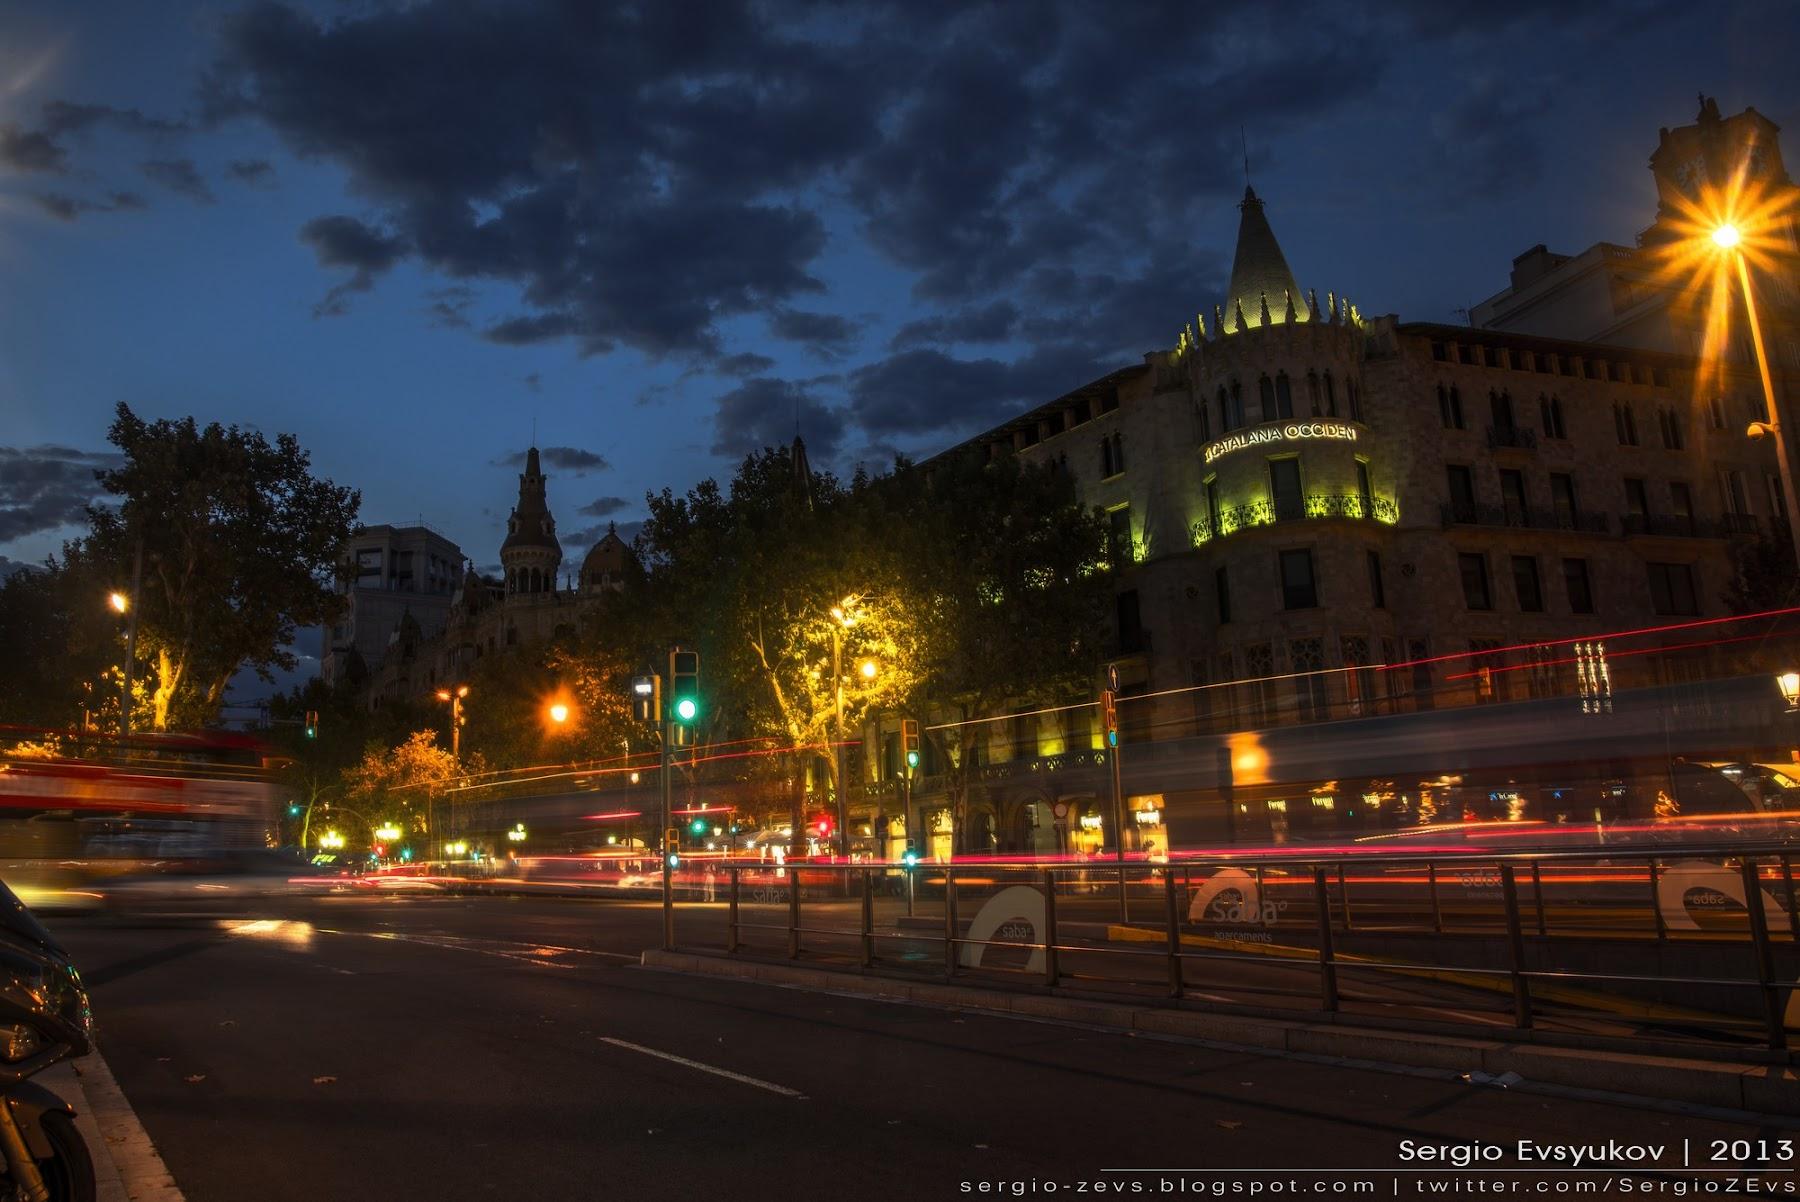 Barcelona's night